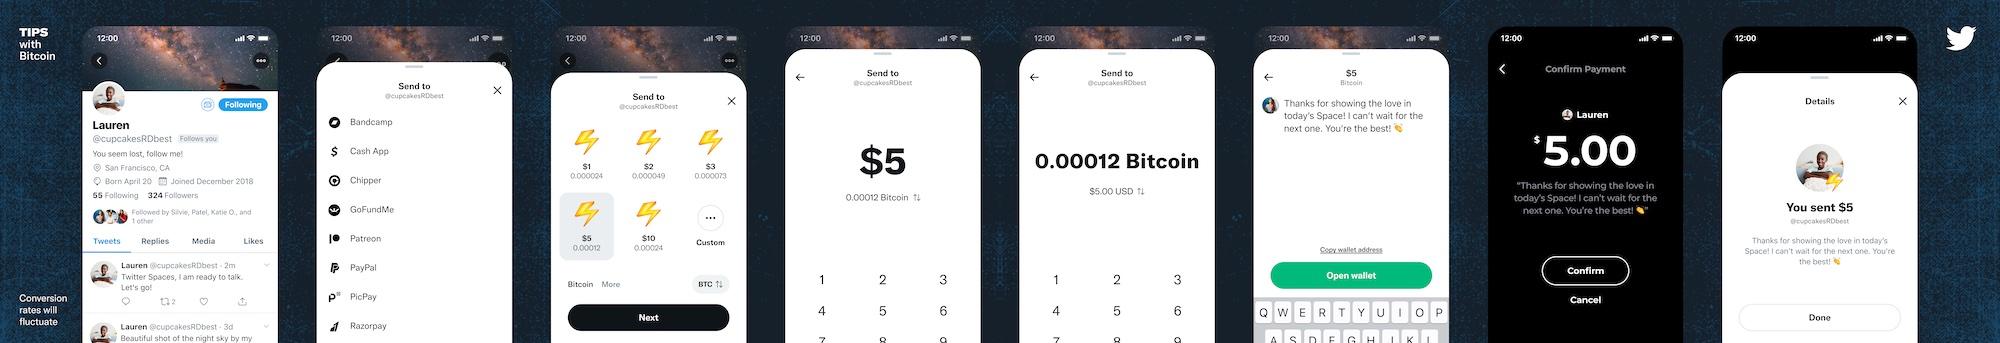 Twitter Tips - Sending a Bitcoin tip through Strike